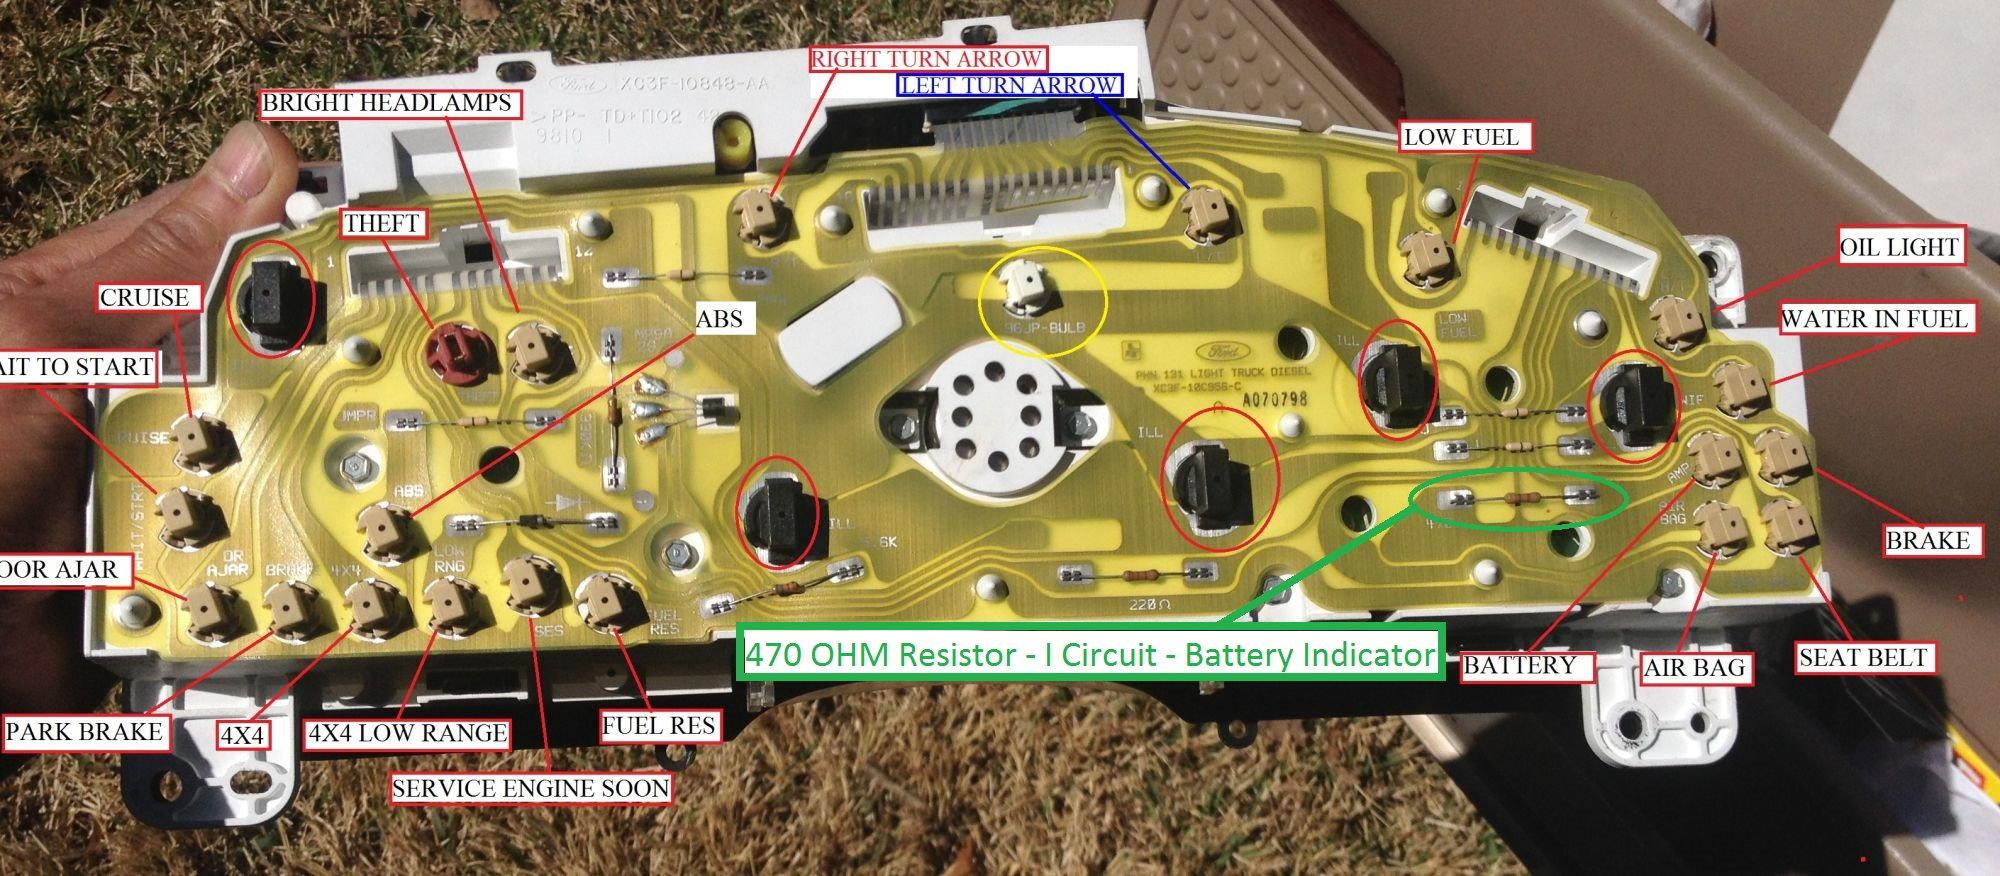 99 f250 diesel battery light on